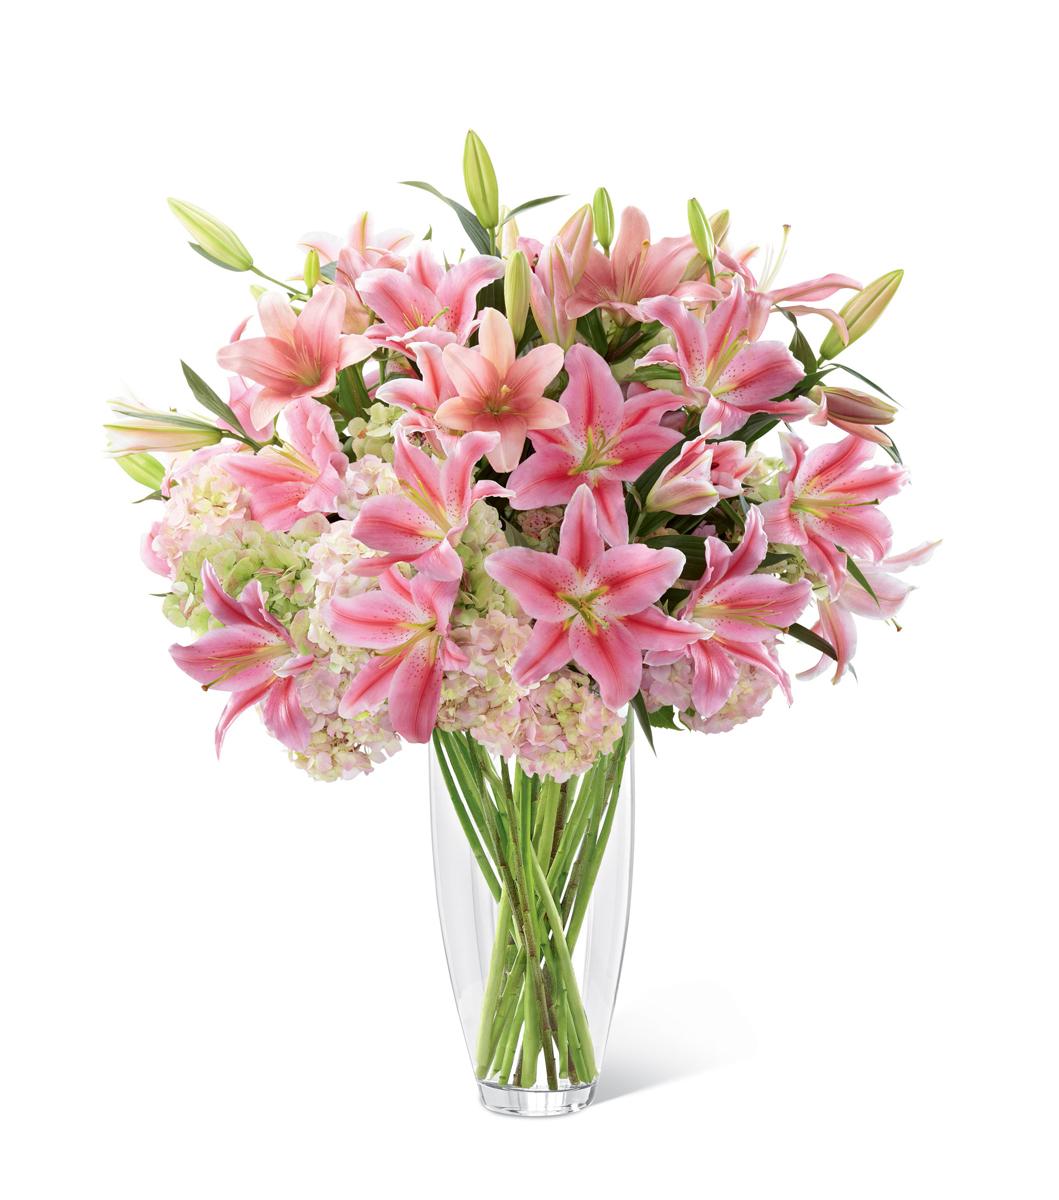 The Ftd Astonishing Bouquet Altamonte Springs Fl Florist